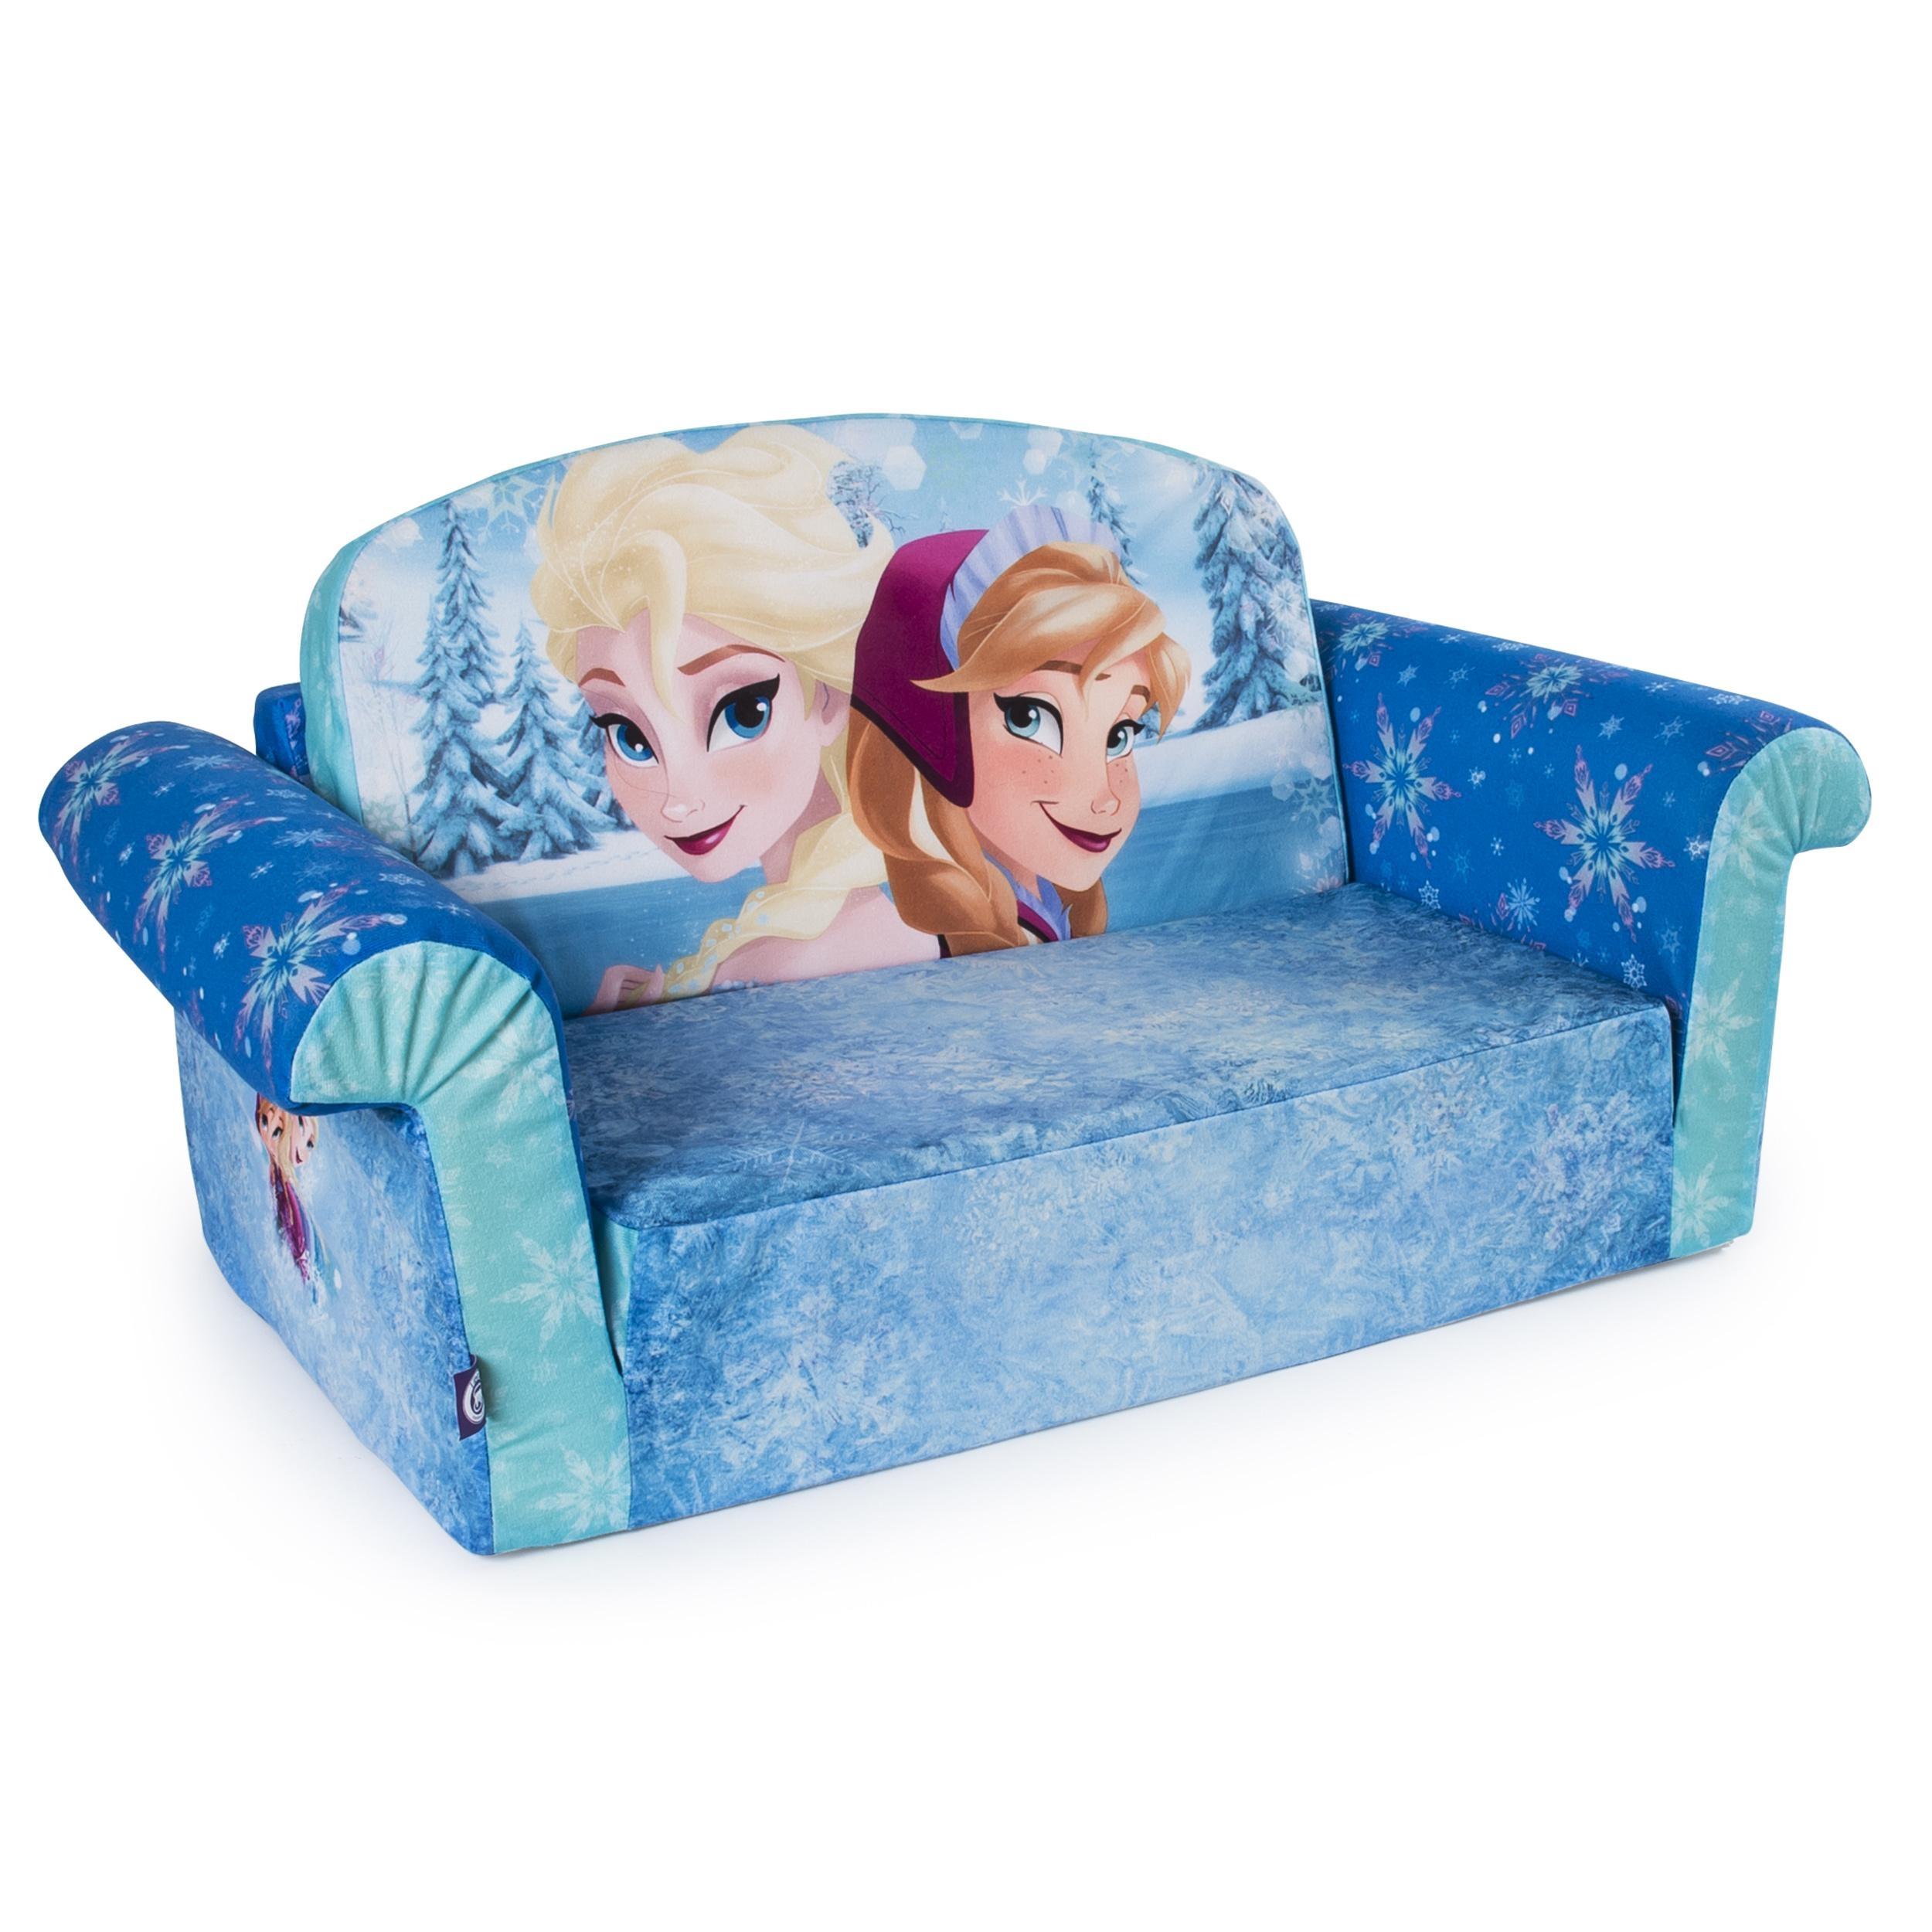 Marshmallow Furniture, Children's 2 In 1 Flip Open Foam Sofa Regarding Flip Open Kids Sofas (View 6 of 20)